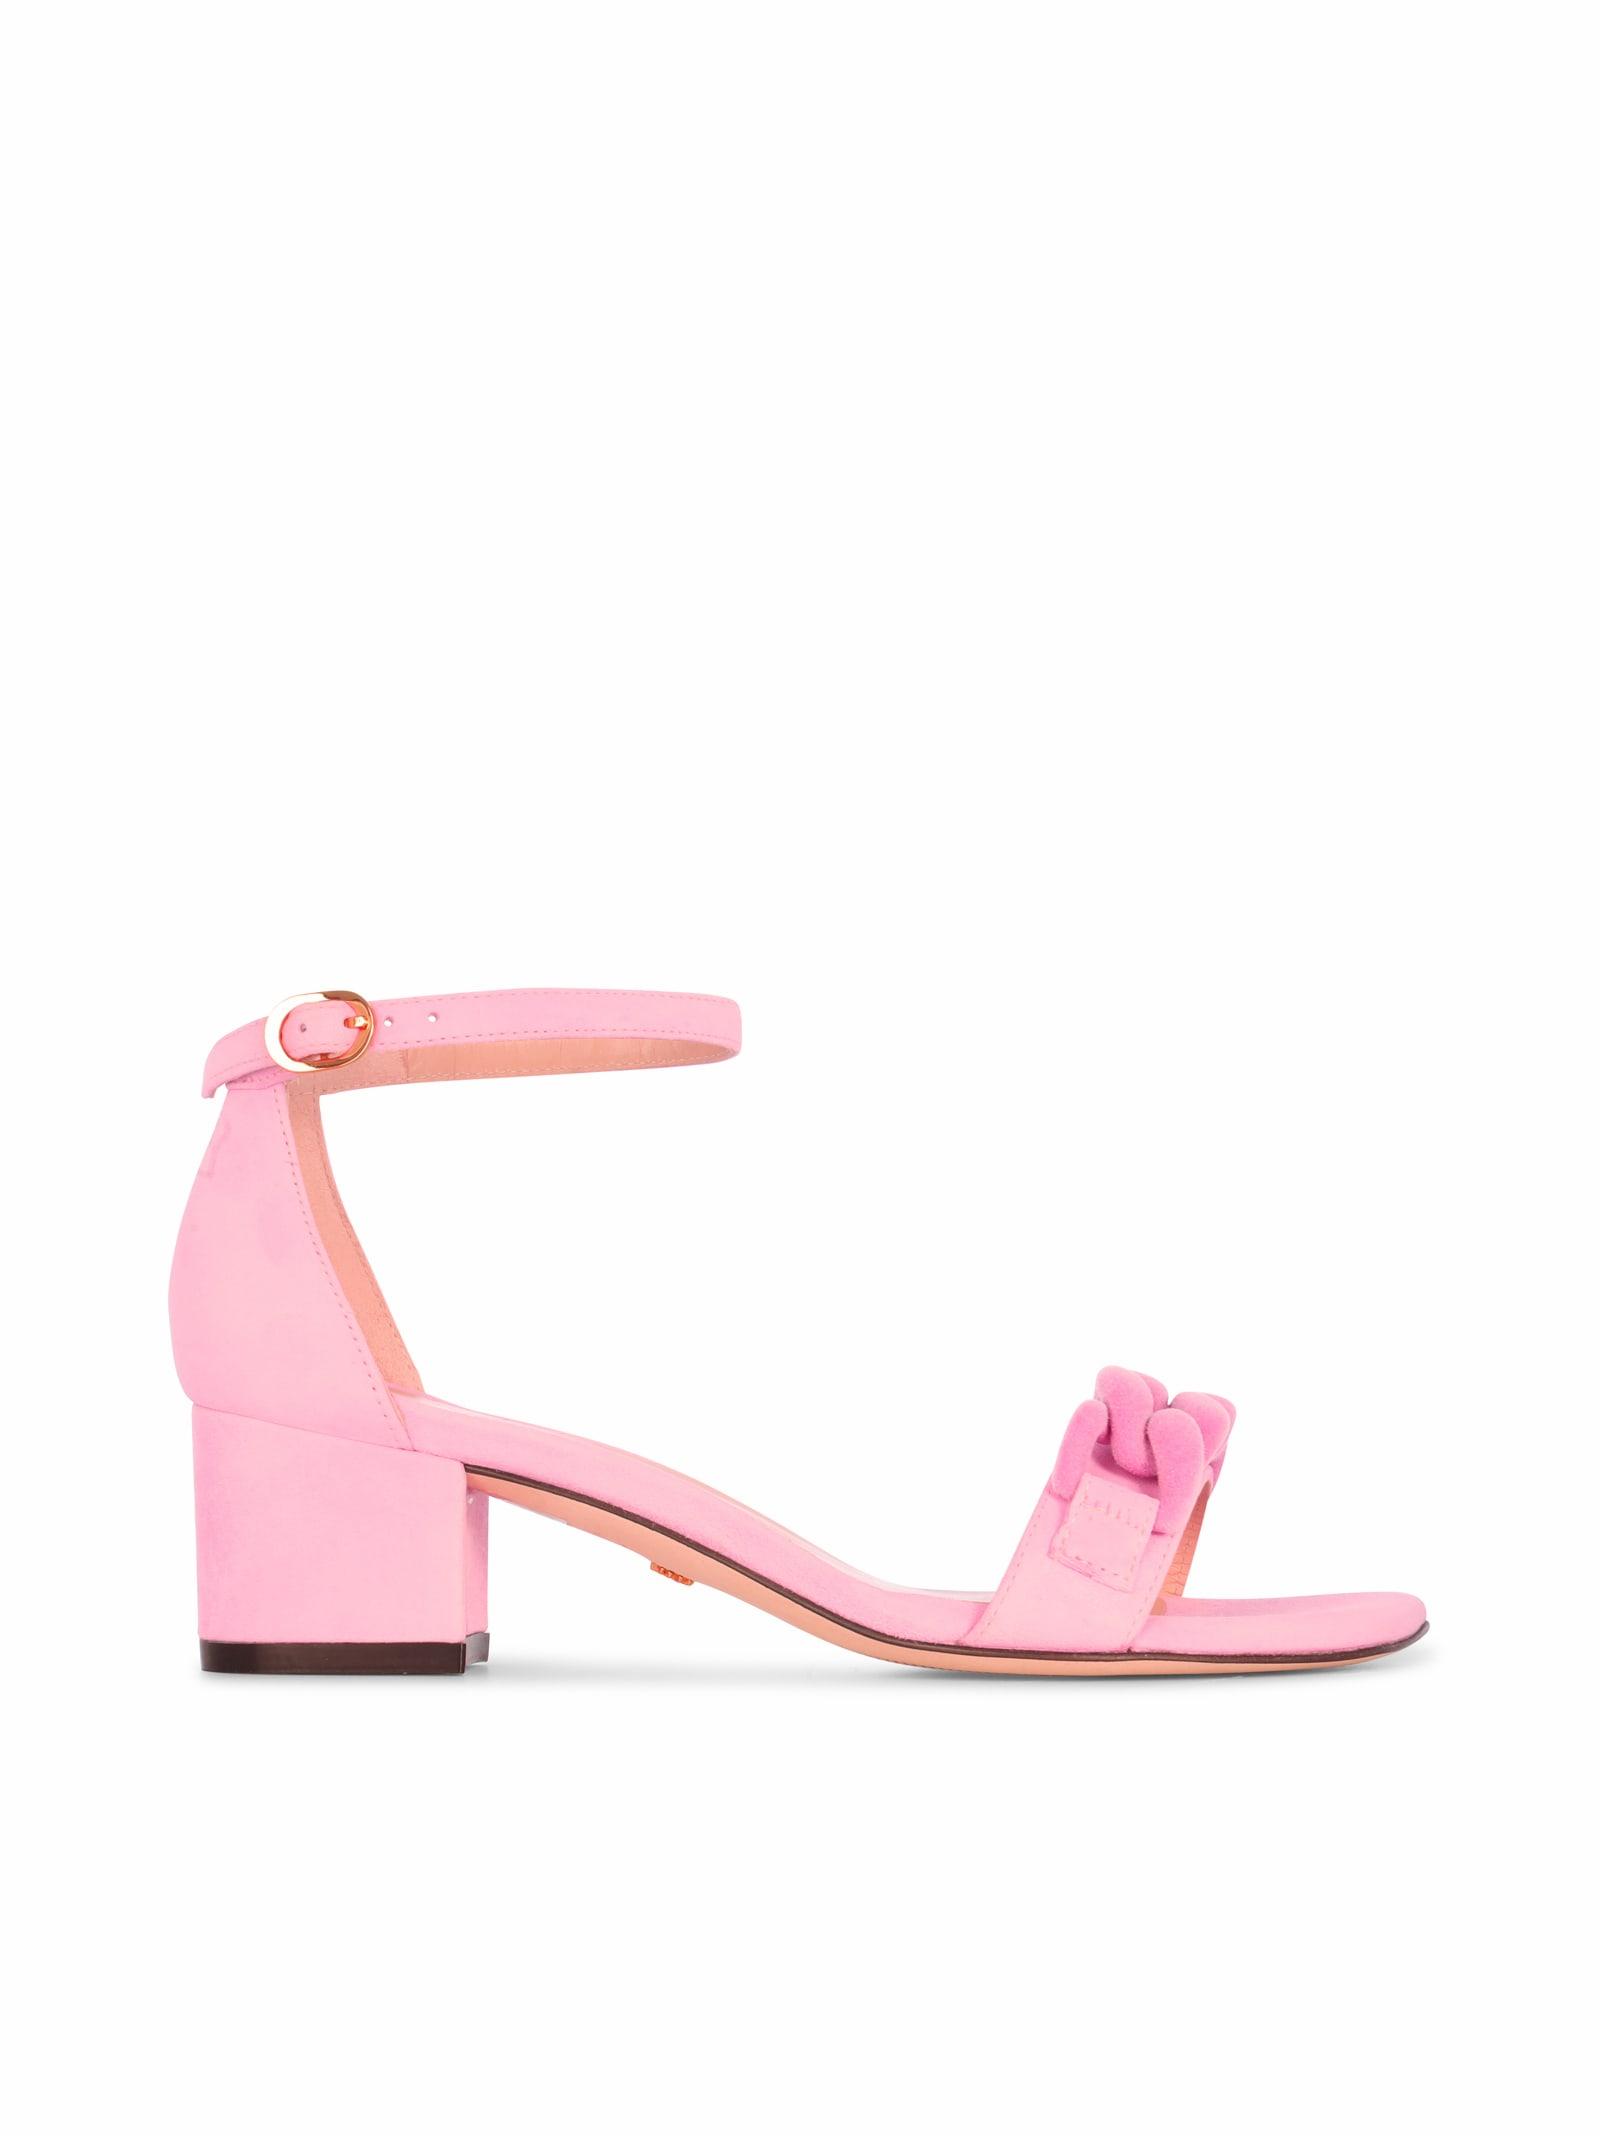 Buy Stuart Weitzman Amelina Block 50 online, shop Stuart Weitzman shoes with free shipping